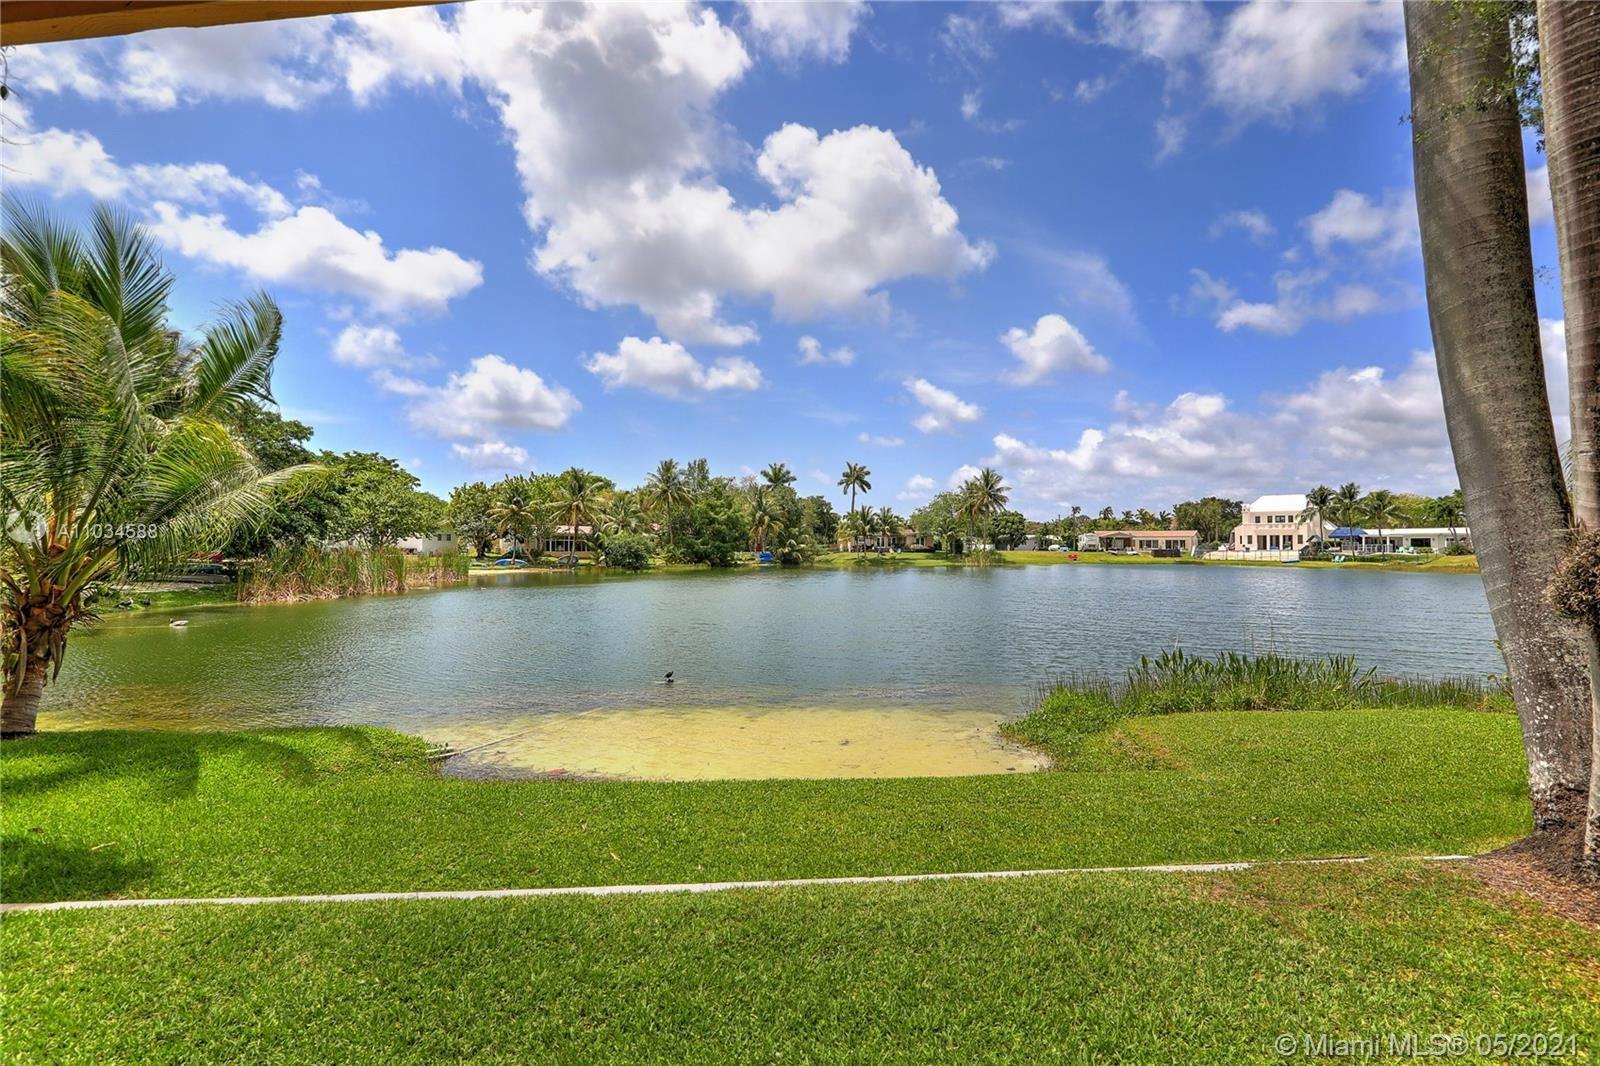 Photo of 6420 SW 50th St, Miami, FL 33155 (MLS # A11034588)